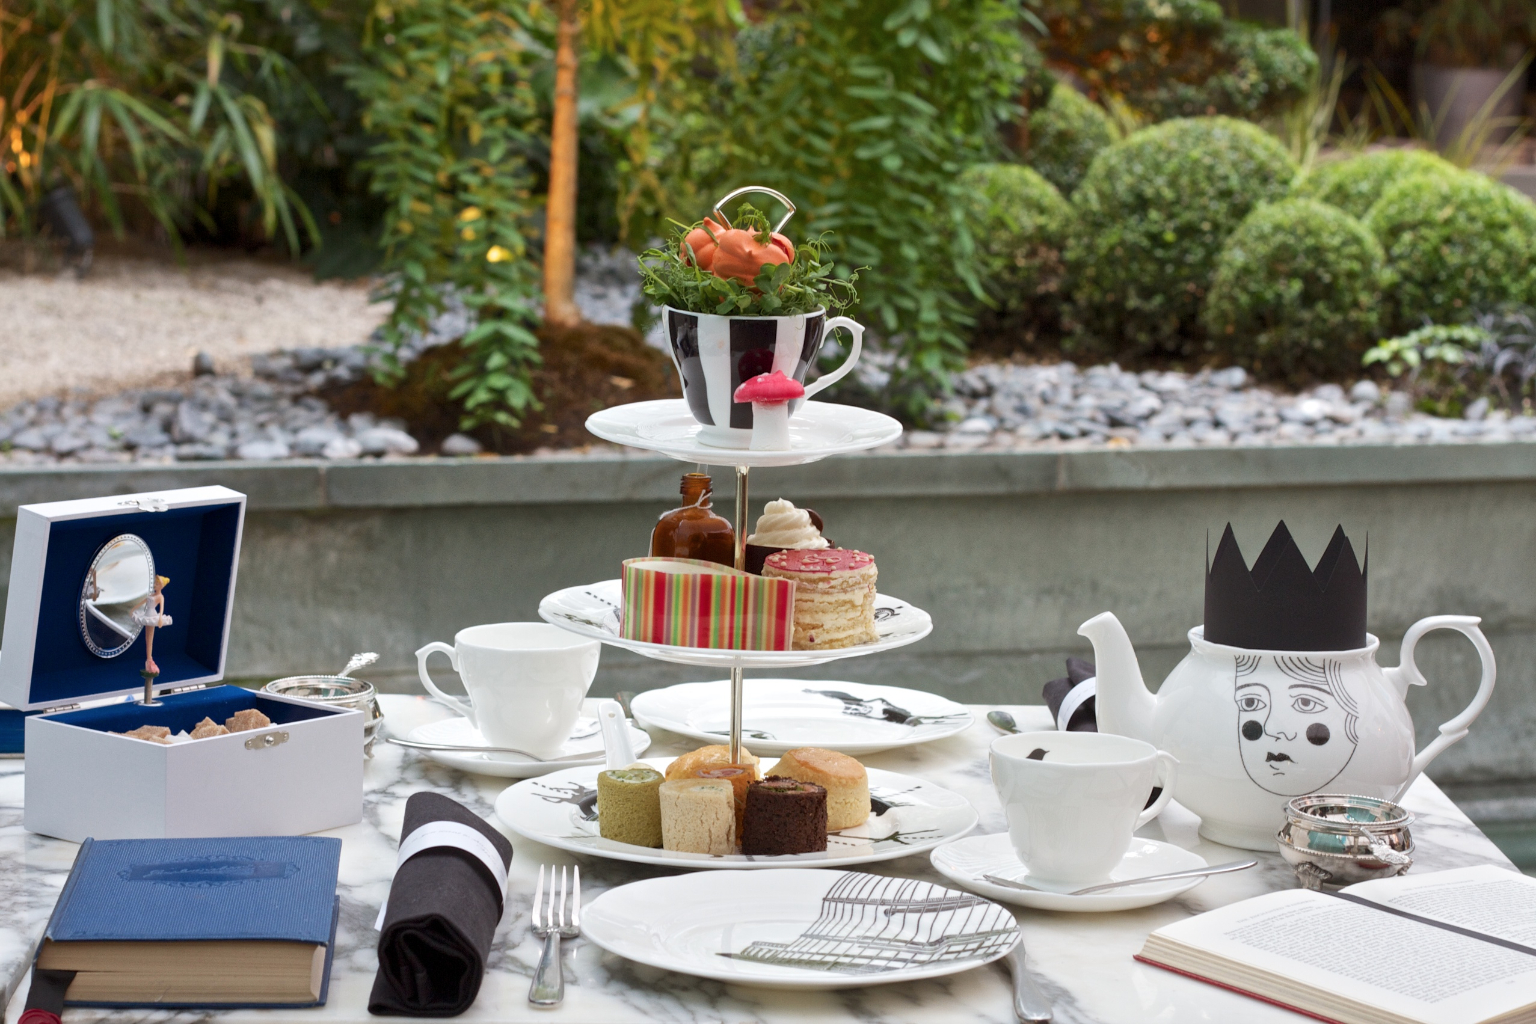 Sanderson Hotel Cappellaio Matto afternoon tea